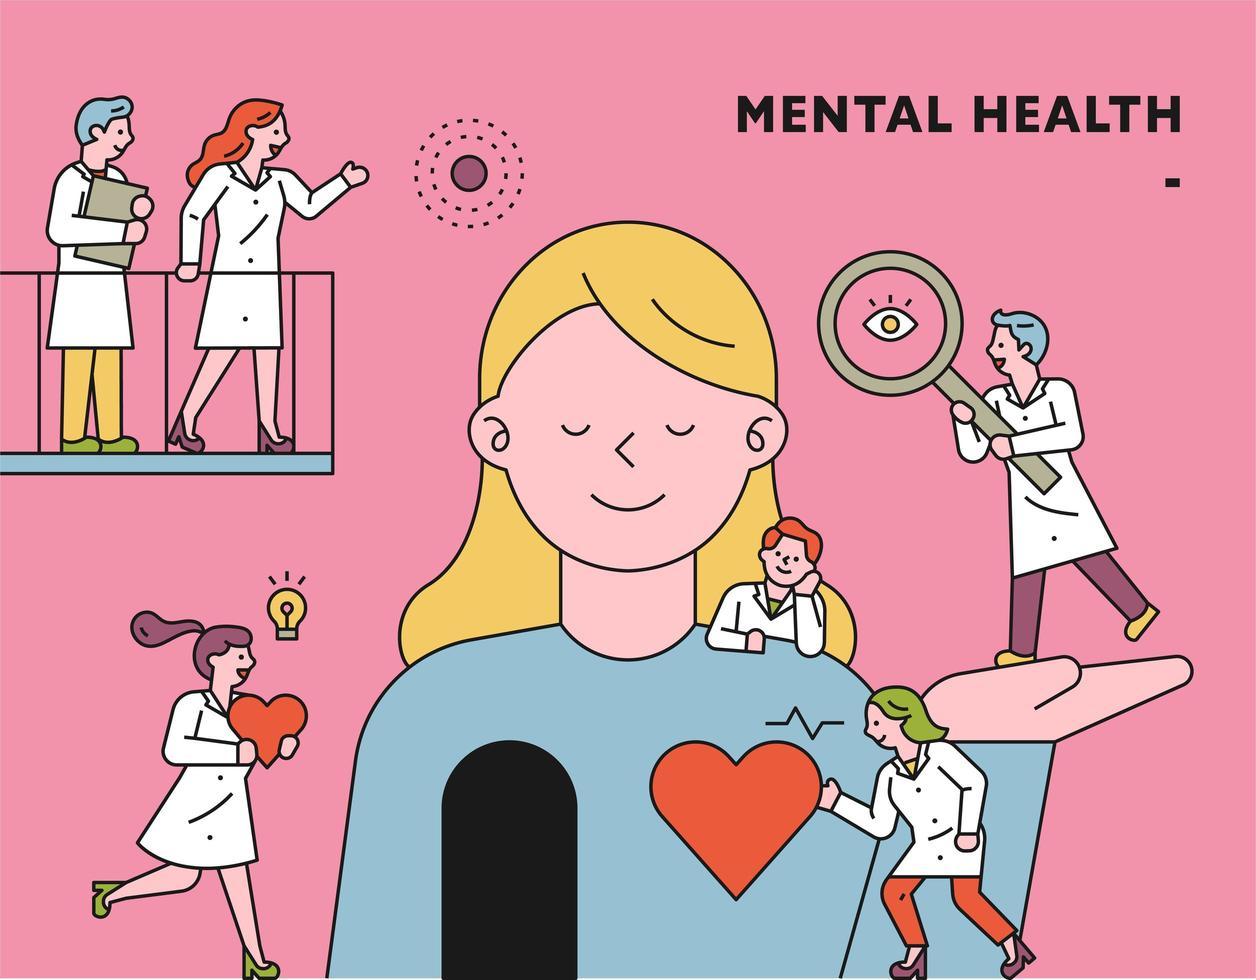 Mental Health concept illustration vector